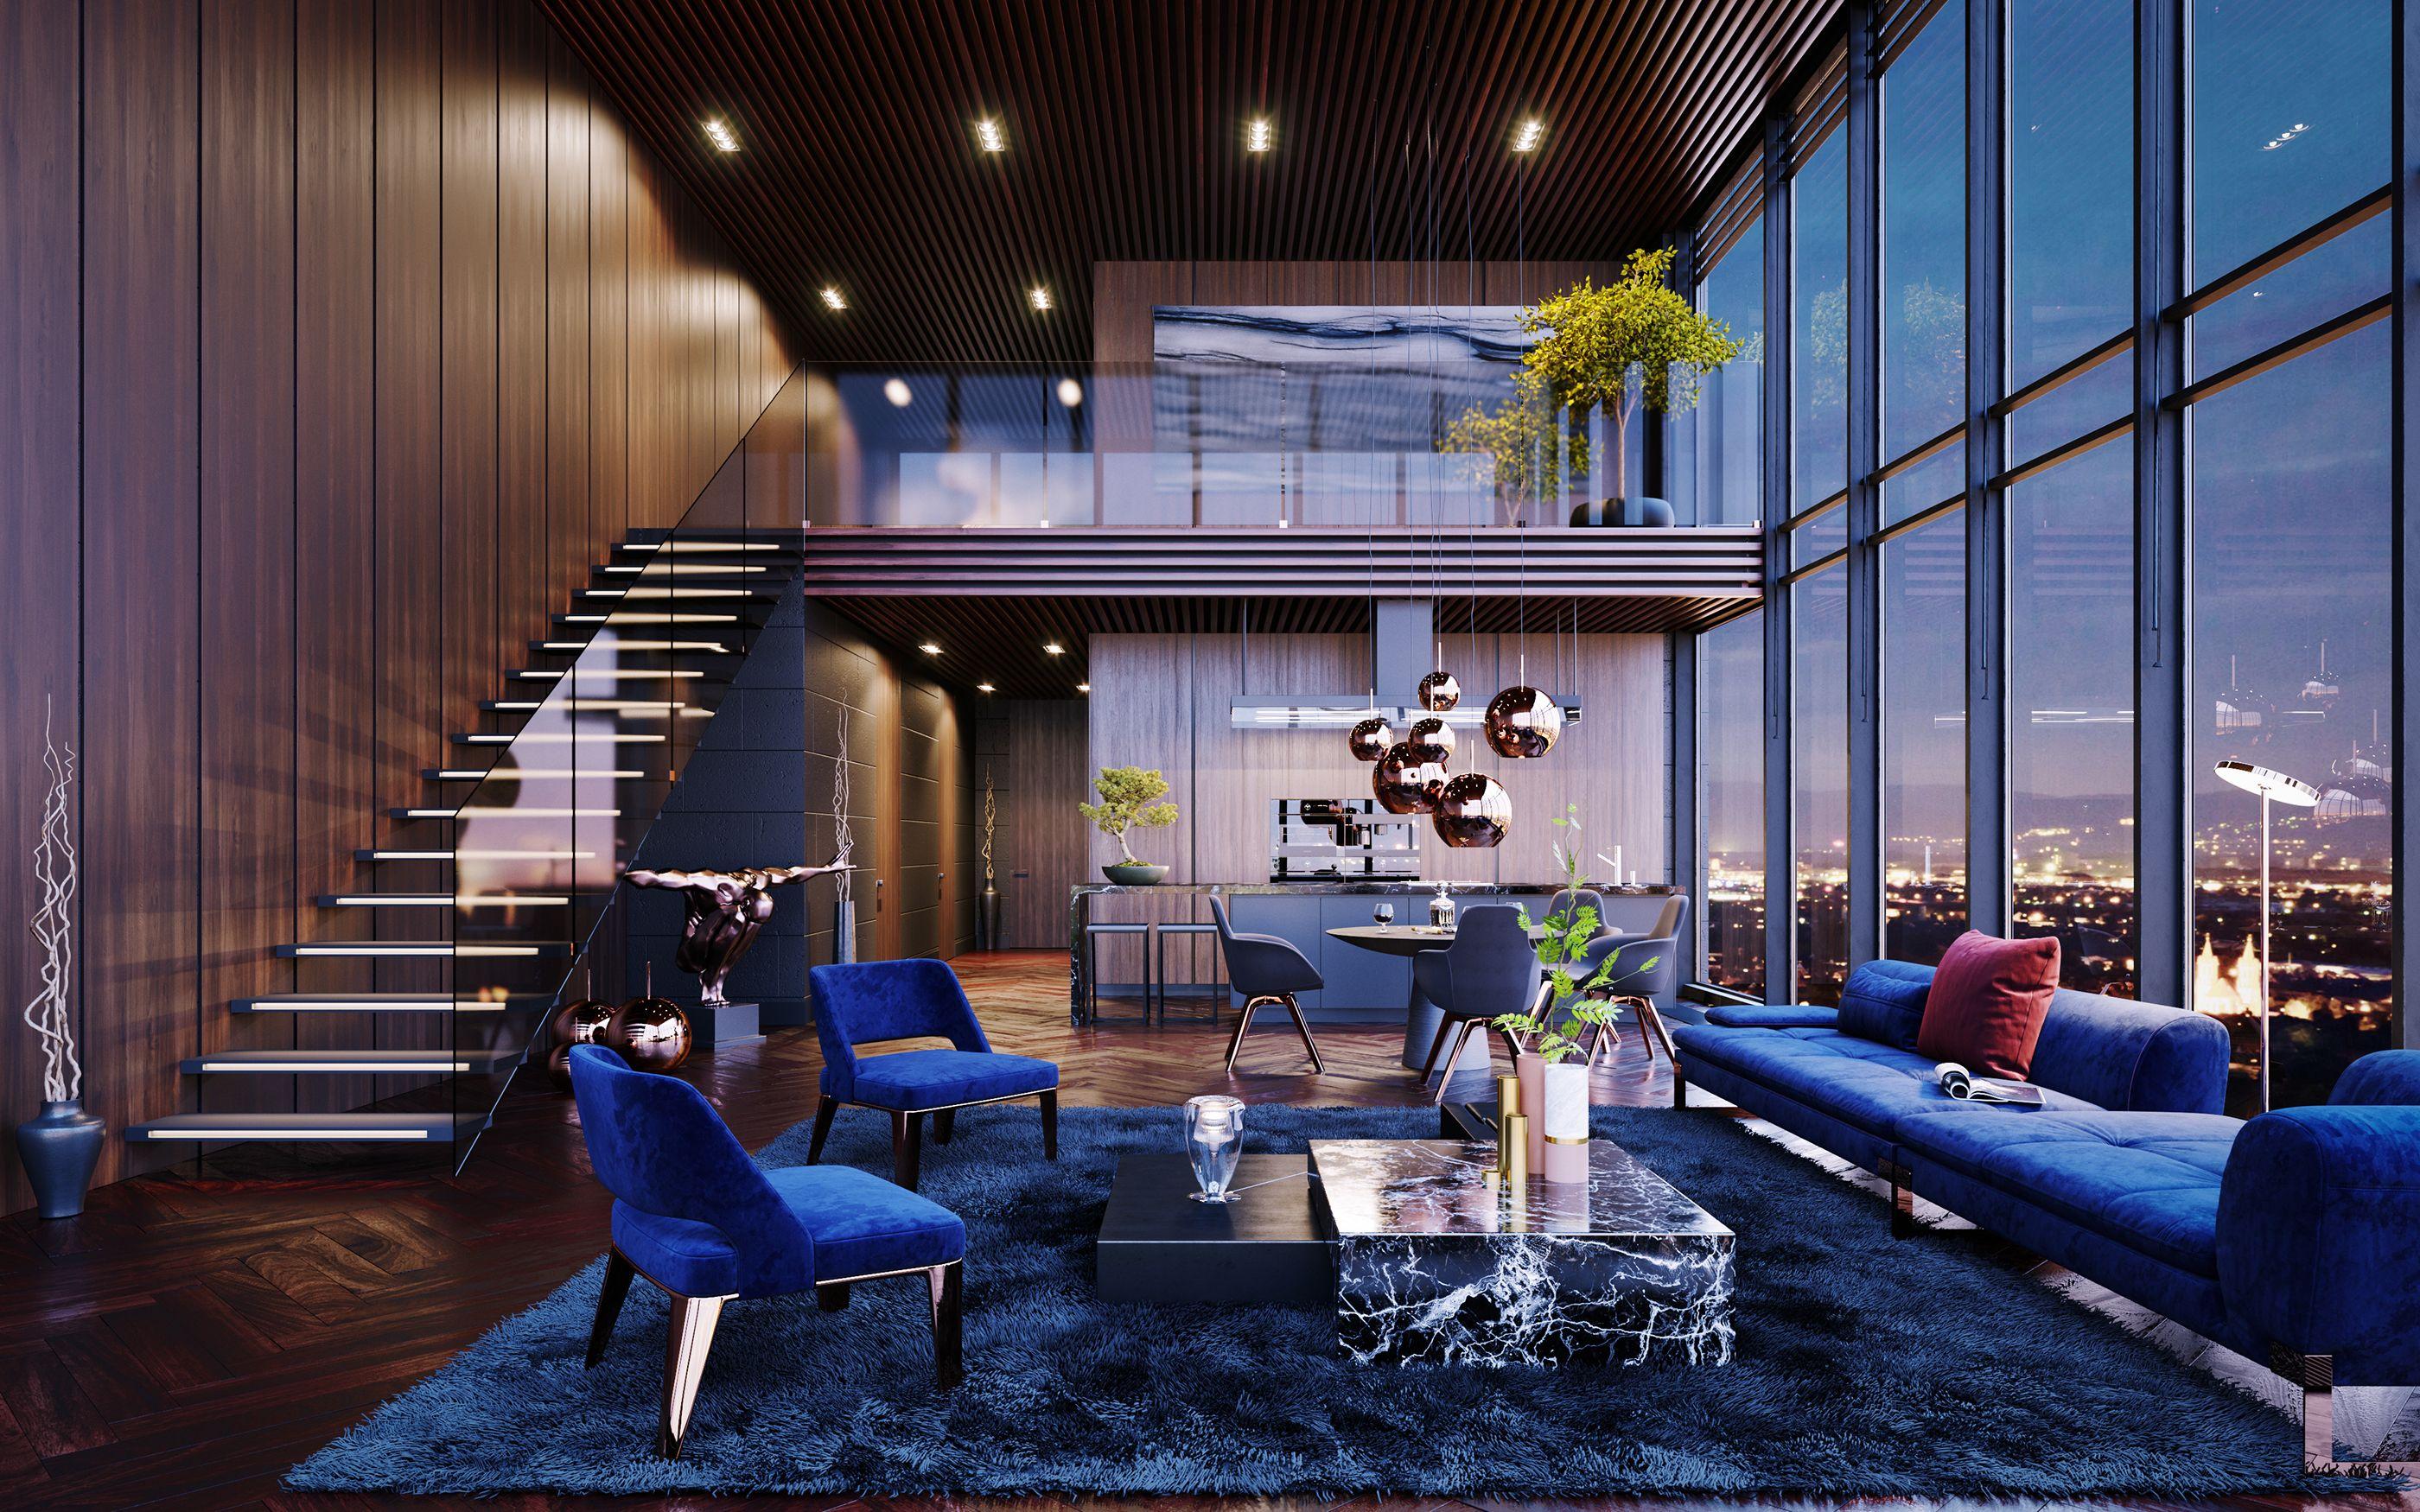 Luxury Penthouse in Los Angeles, USA CGI on Behance